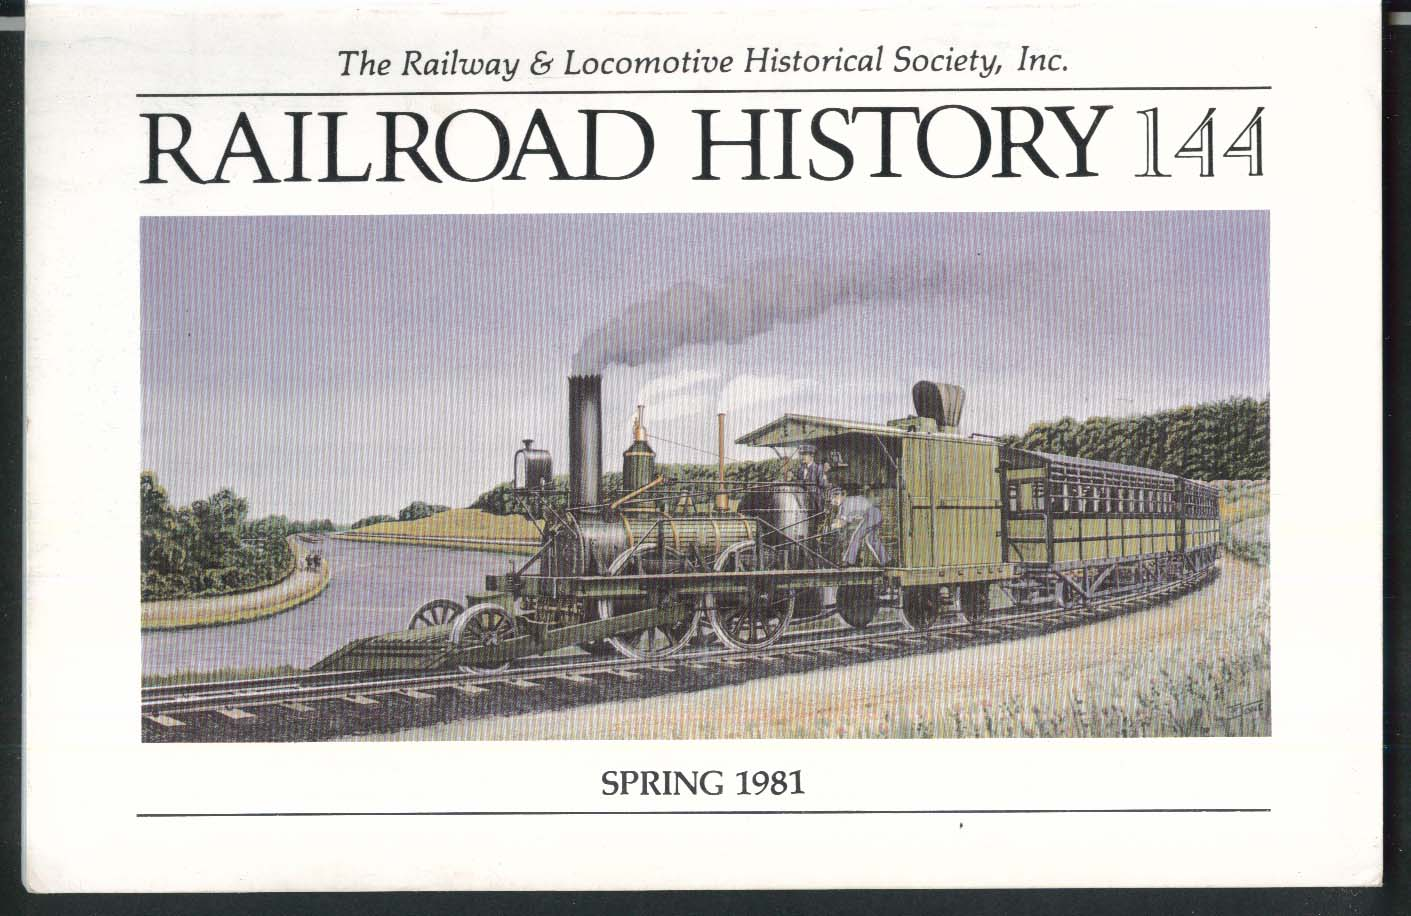 RAILROAD HISTORY #144 Railway & Locomotive Historical Society Spring 1981